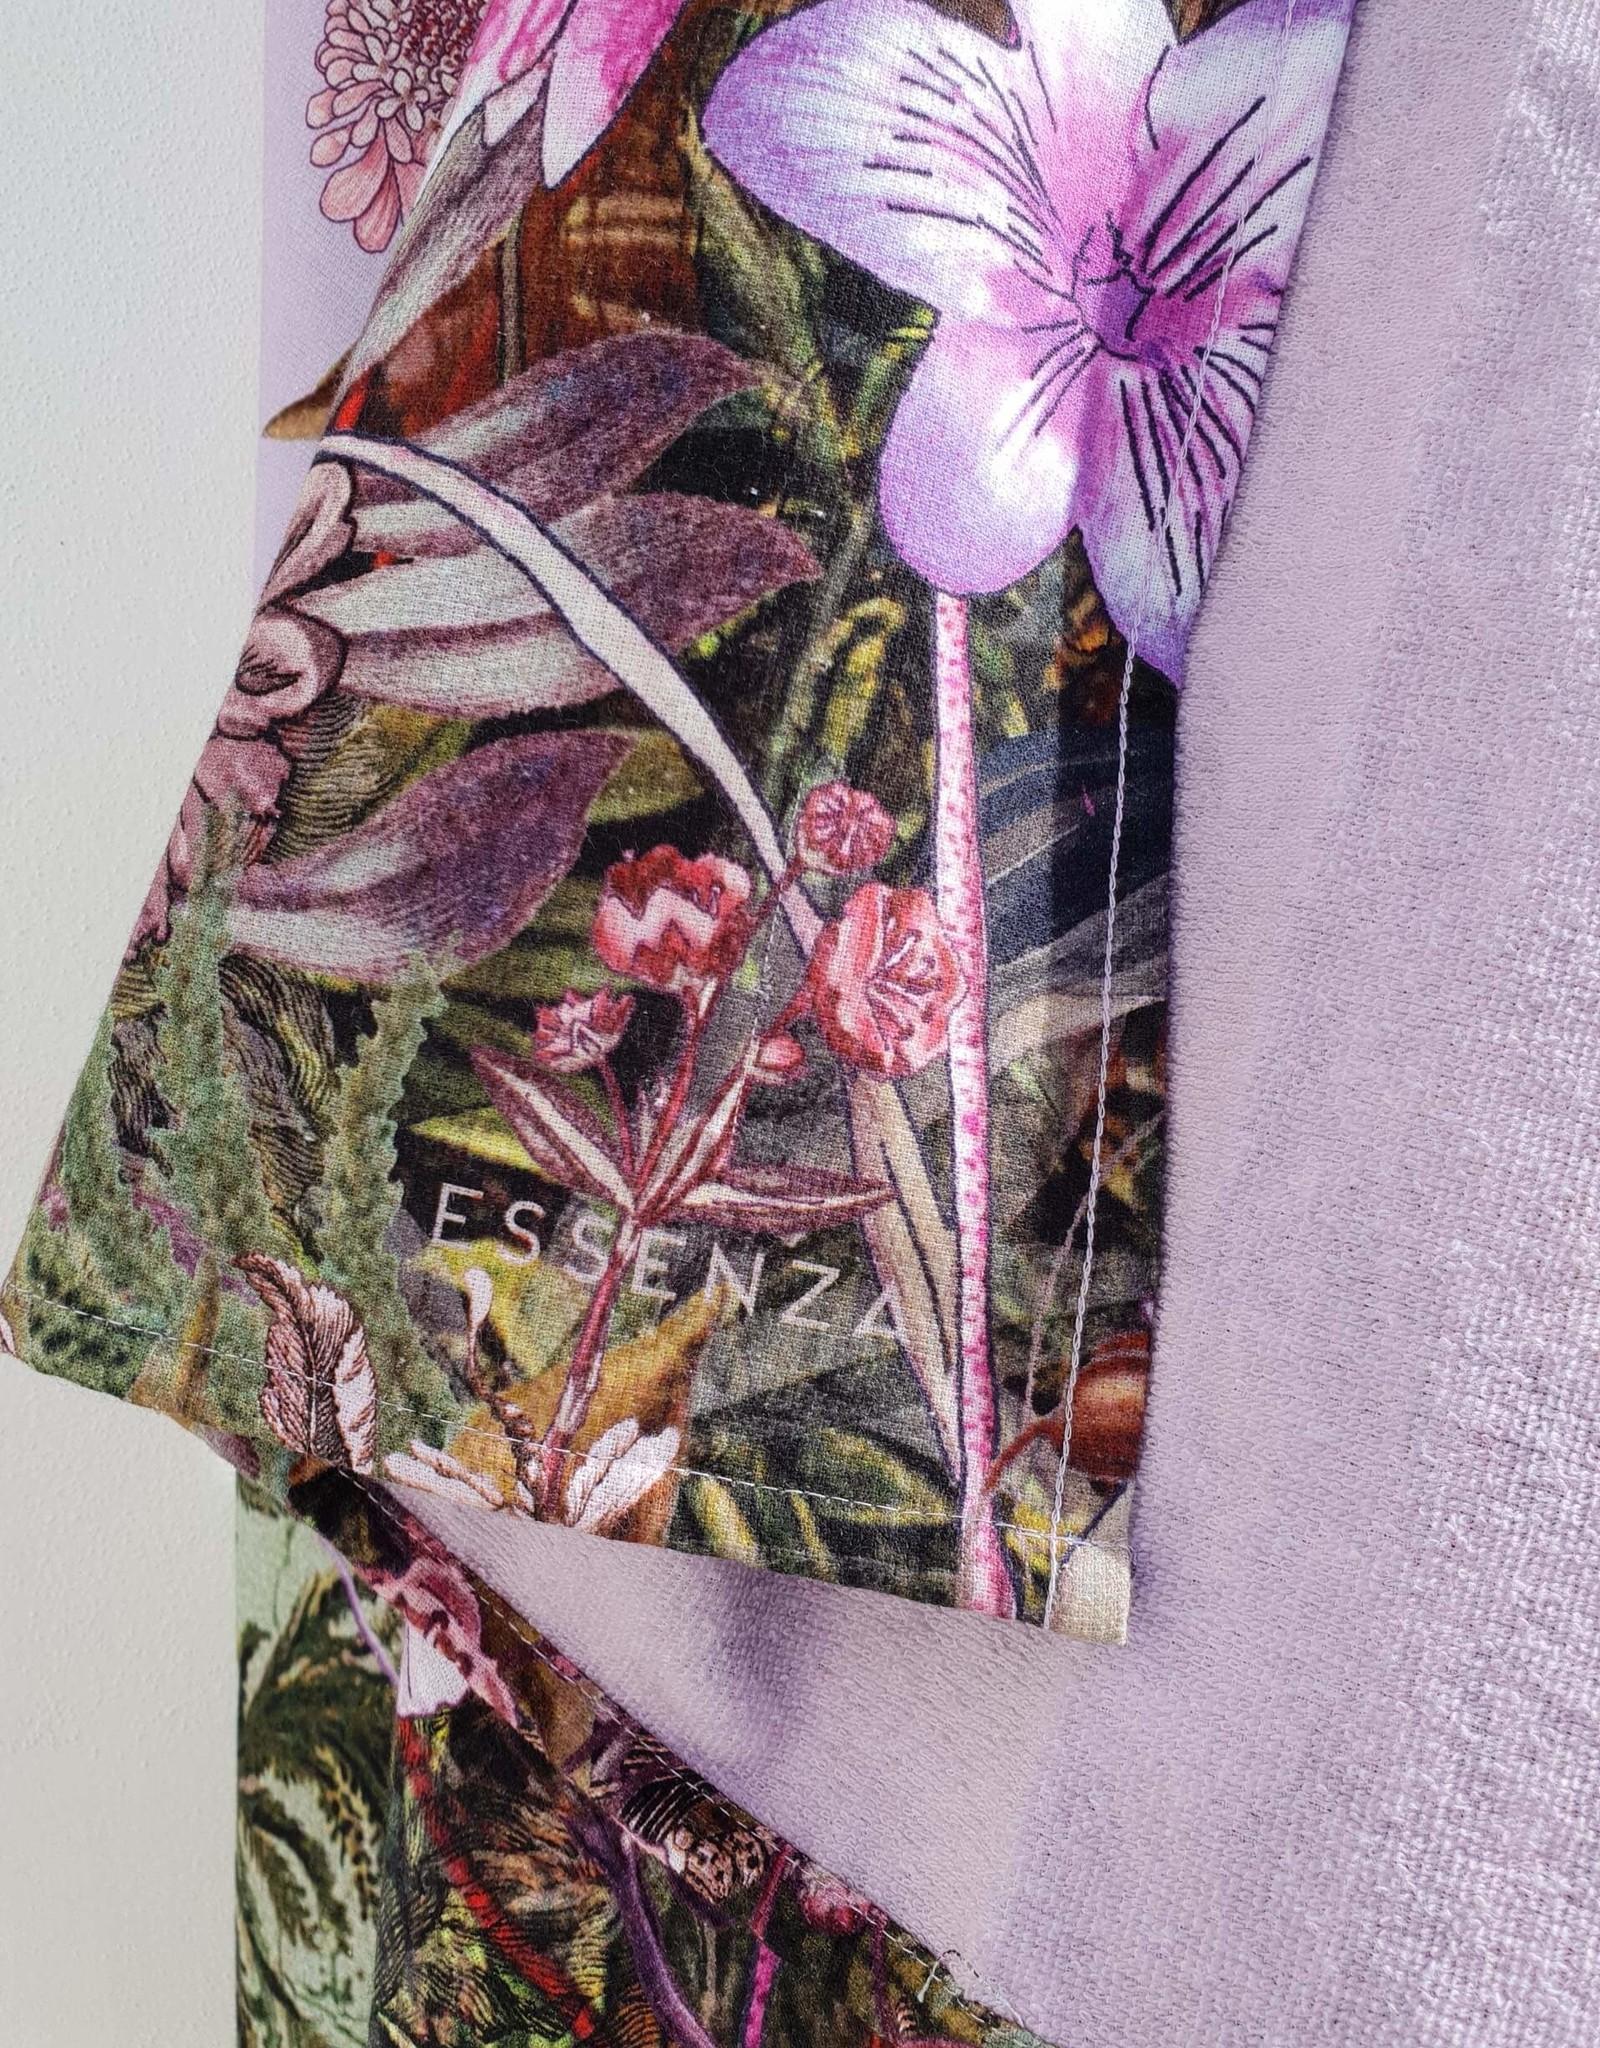 Essenza XL Strandlaken - Lilac Flowers